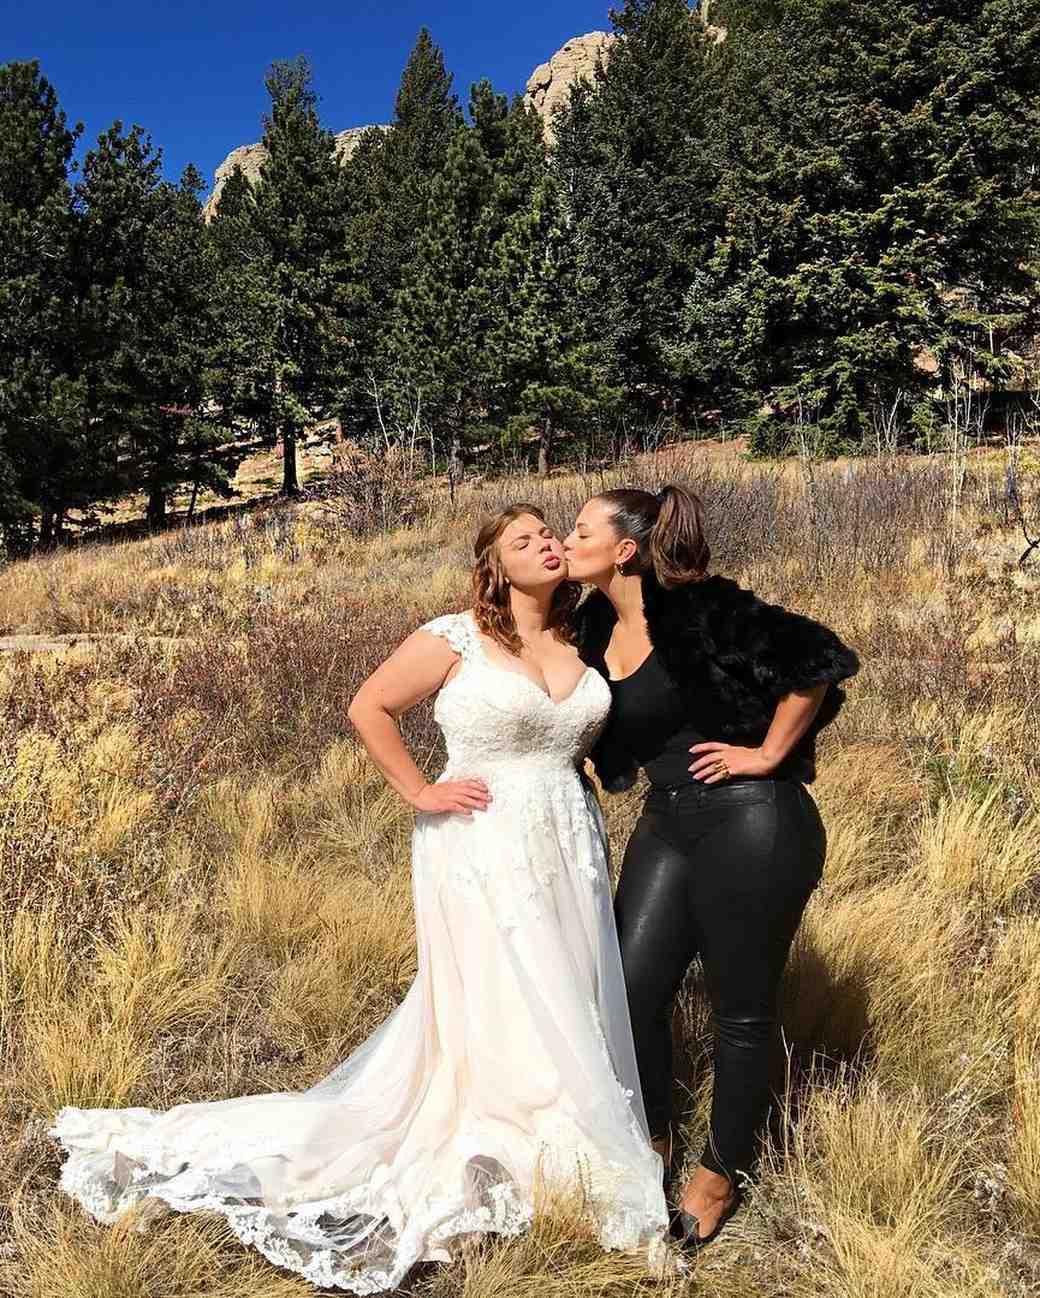 ashley-graham-celeb-wedding-guest-1016